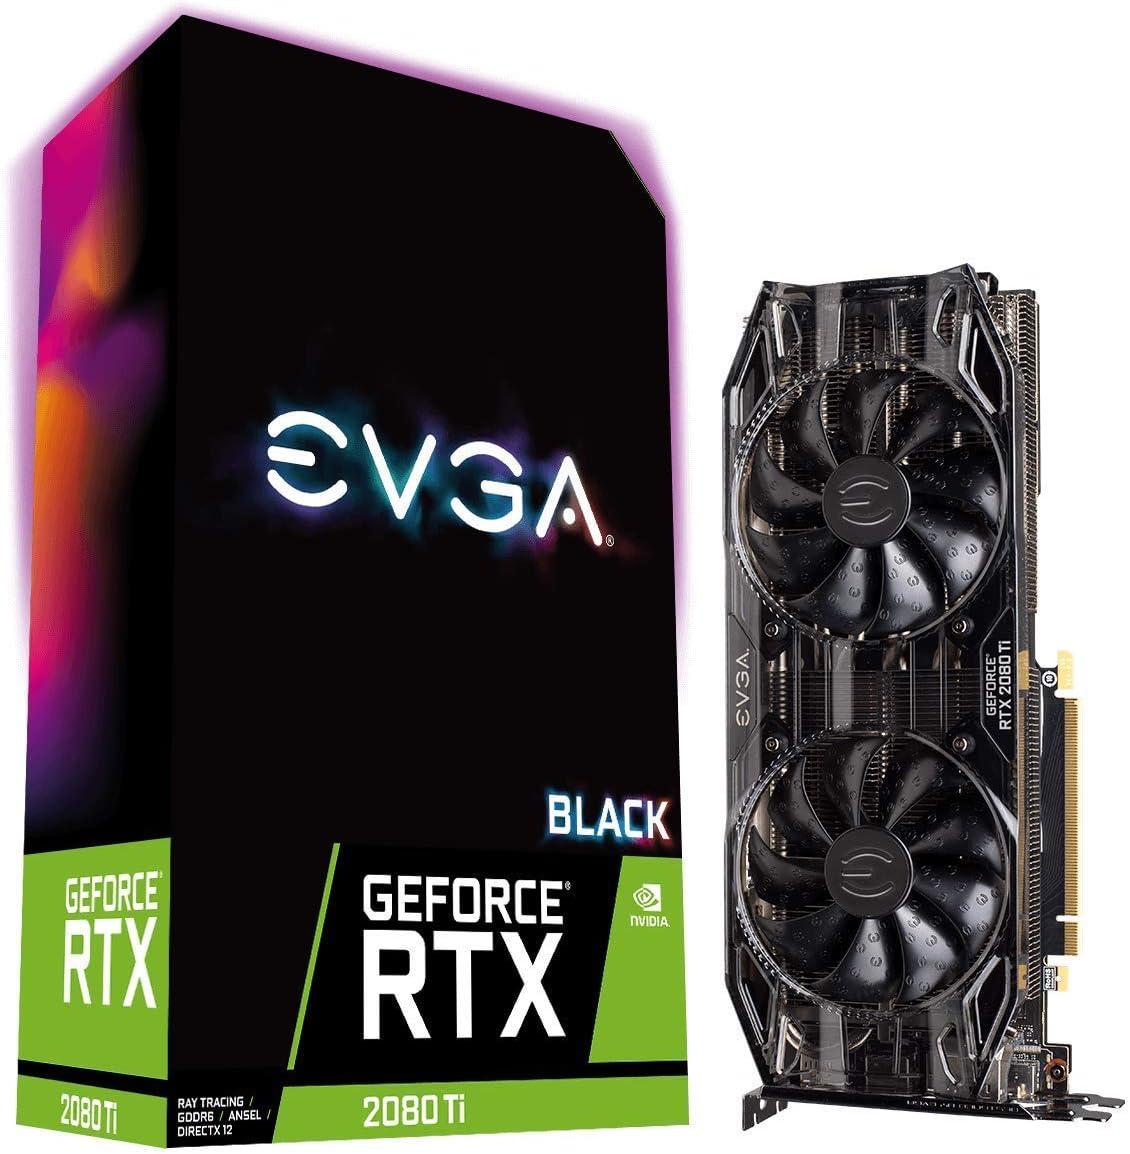 EVGA GeForce RTX 2080 Ti Black Edition Gaming, 11GB GDDR6, Dual HDB Fans & RGB LED Graphics Card 11G-P4-2281-KR (Renewed)